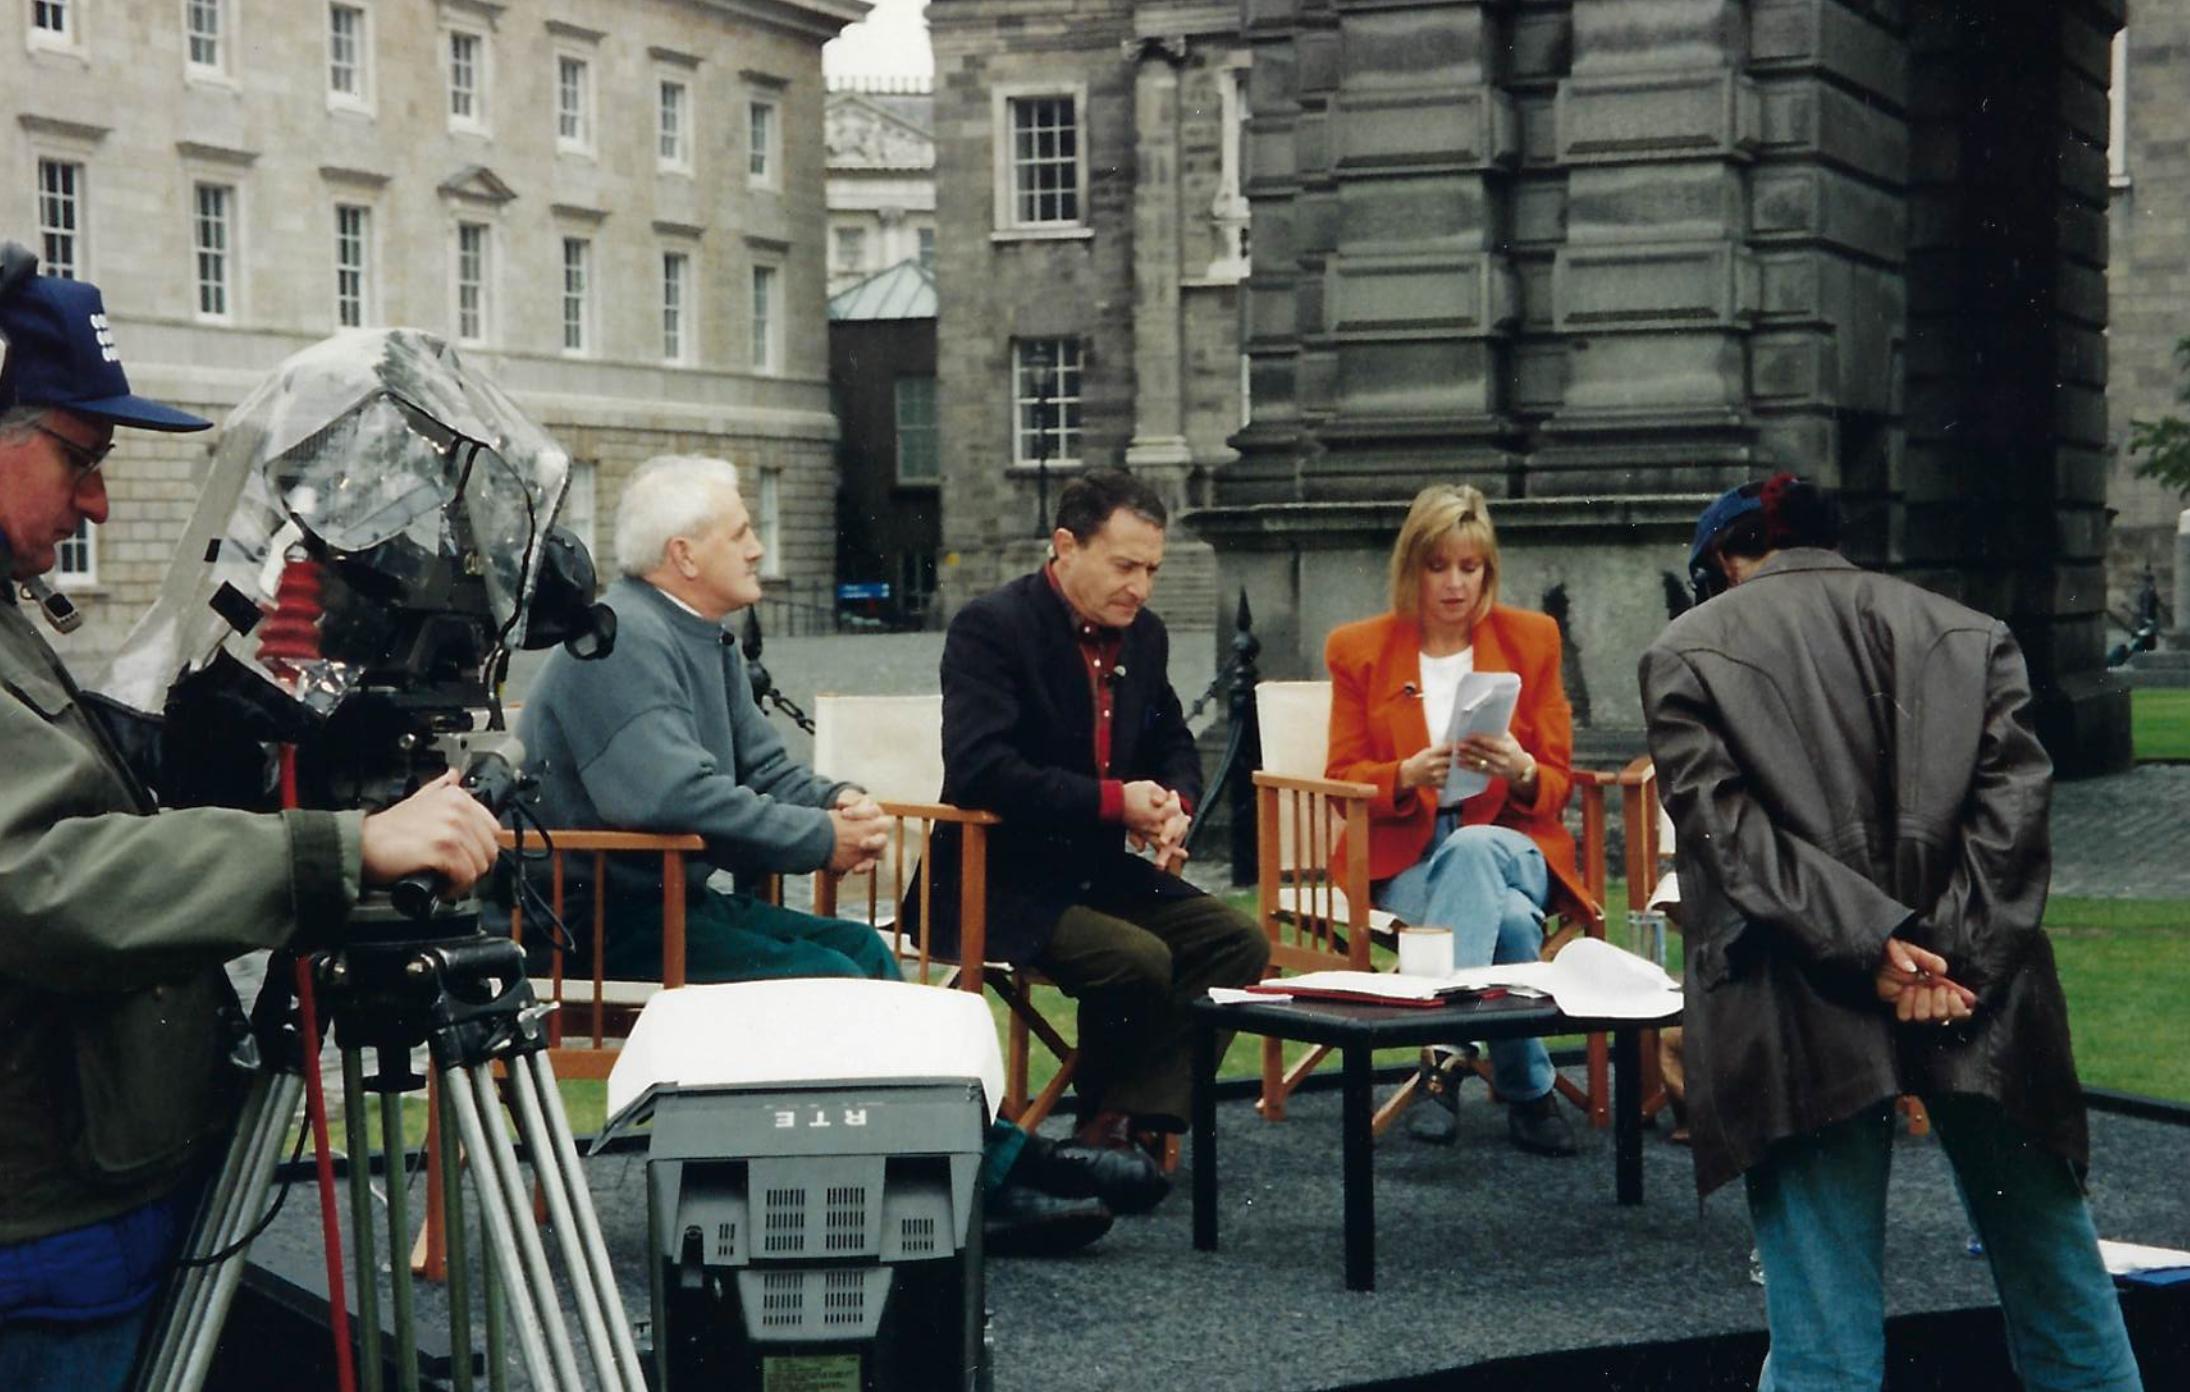 Steve and Liz Hayes on set in Ireland.